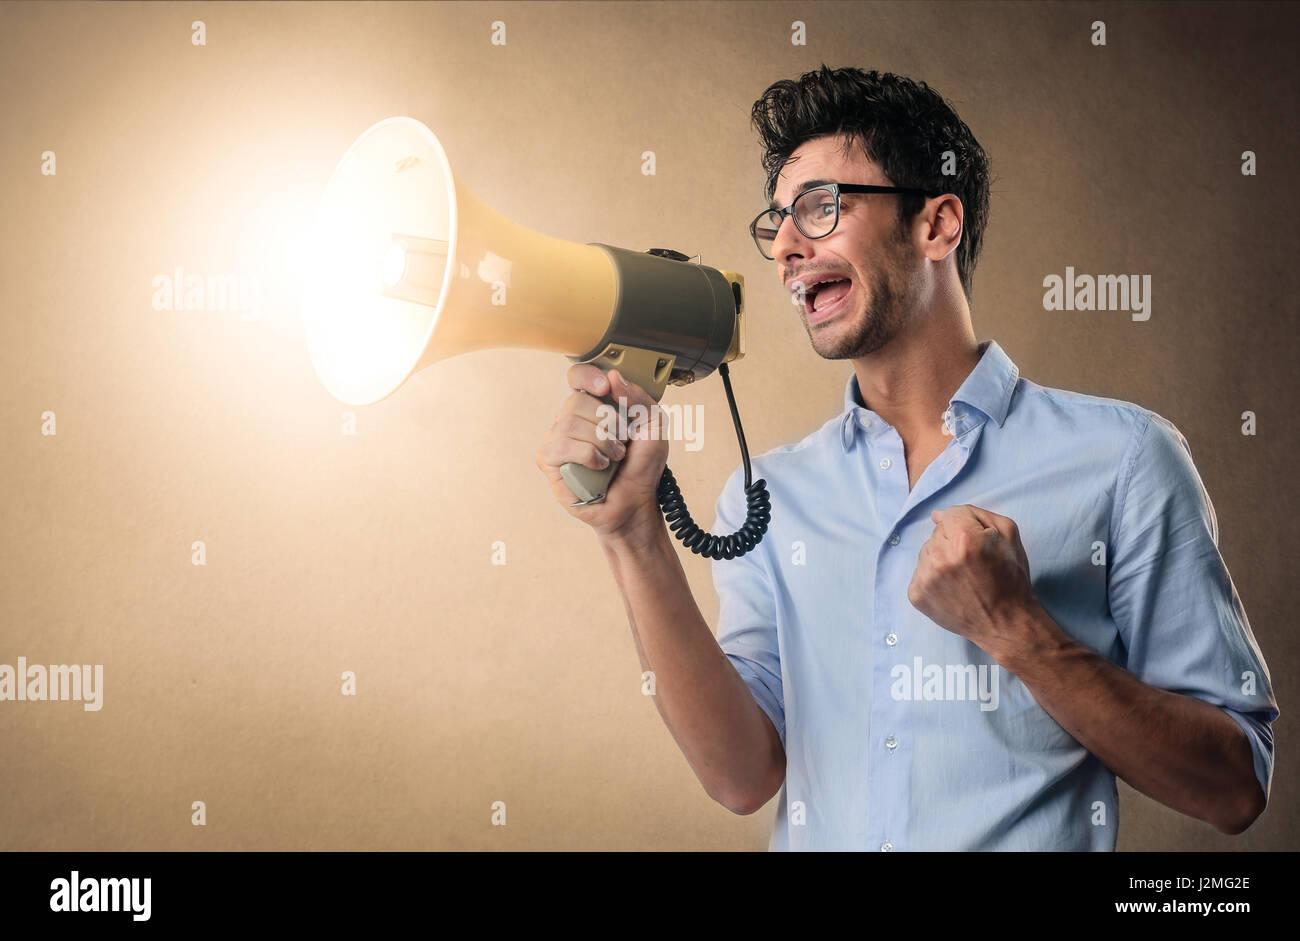 Man yelling with megaphone - Stock Image